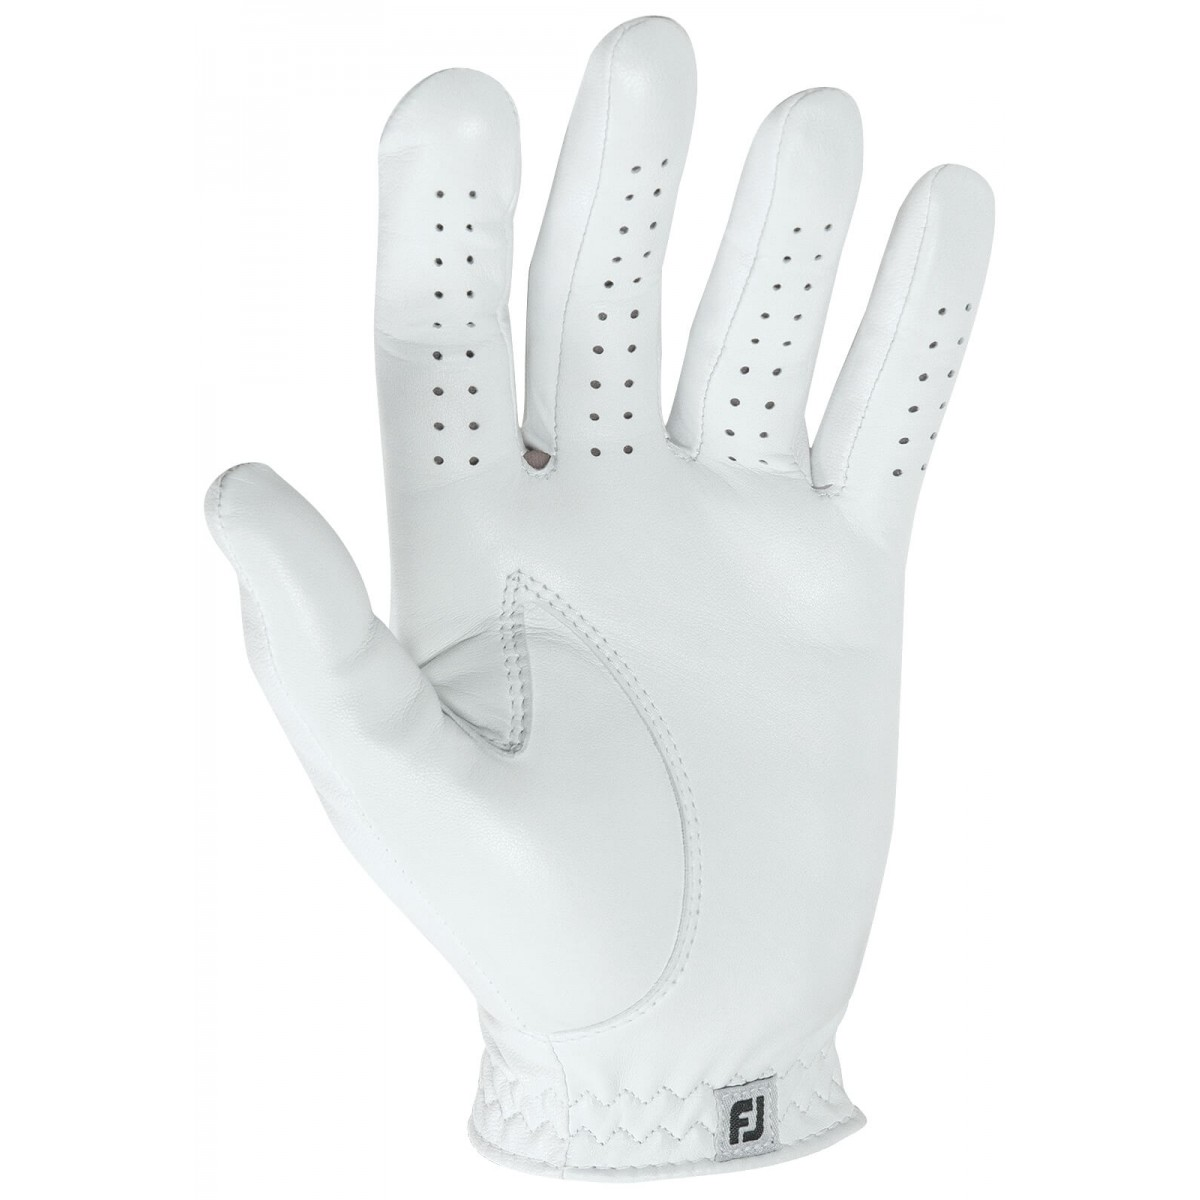 FootJoy Men's 2020 Contour FLX Golf Glove - Left Hand Regular